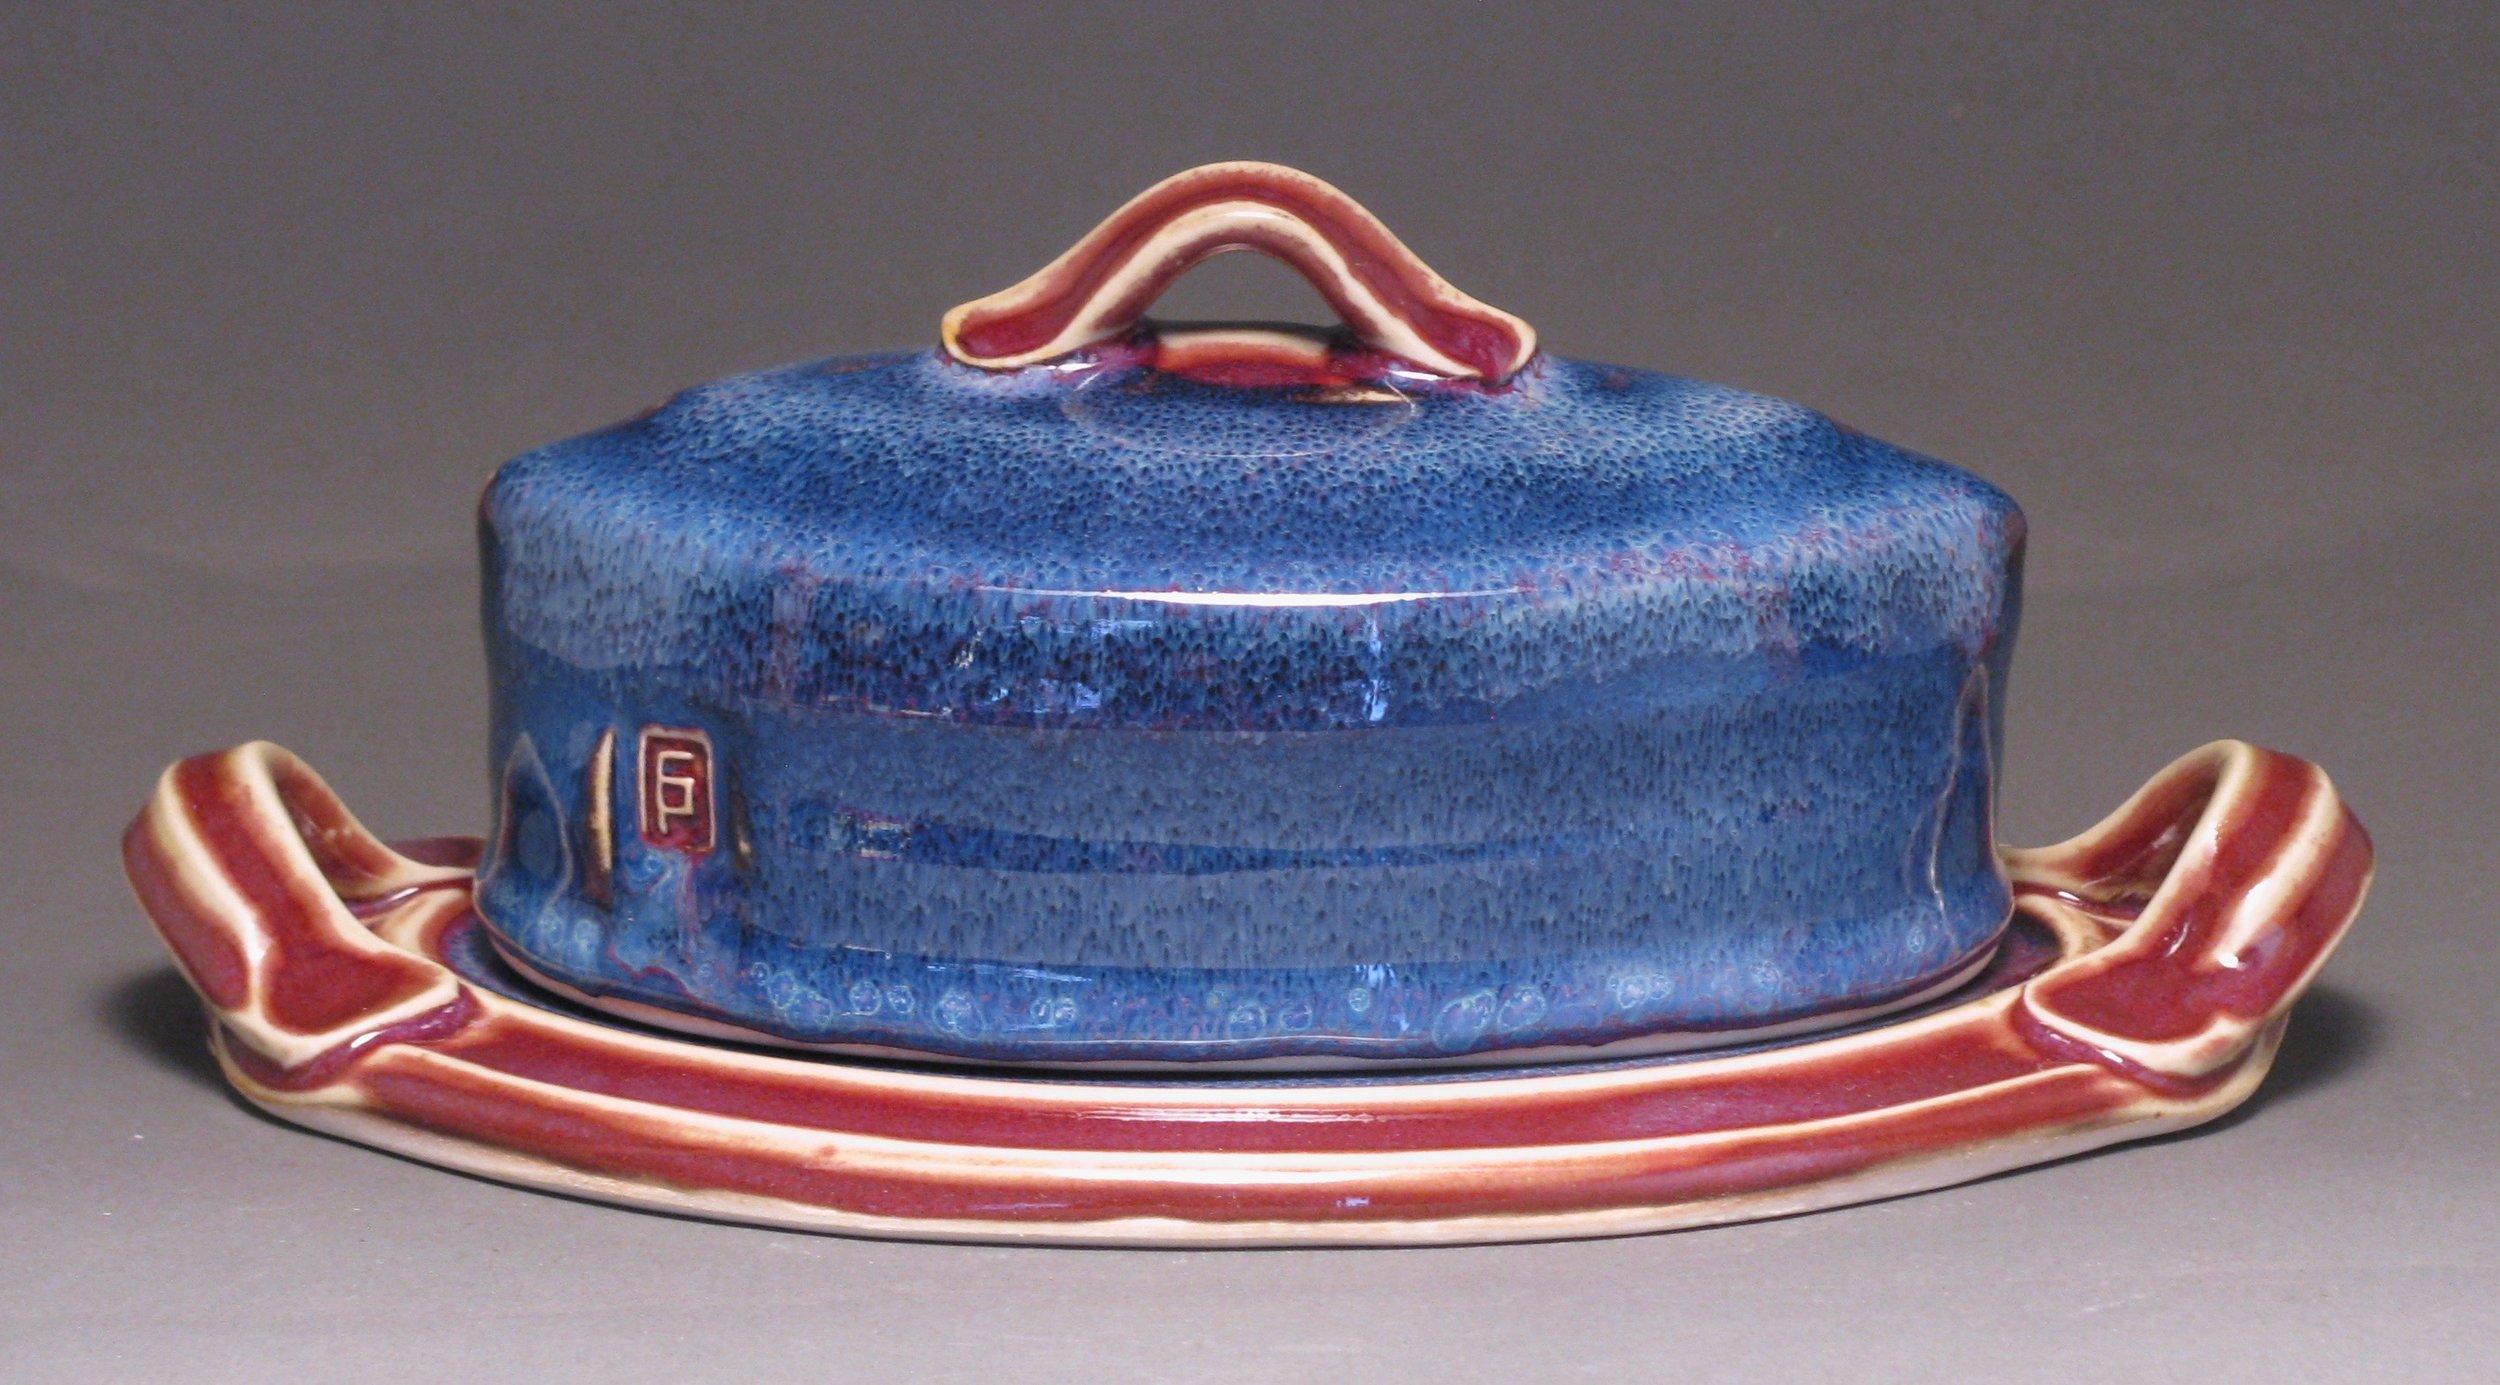 Butter dish with purple haze glaze